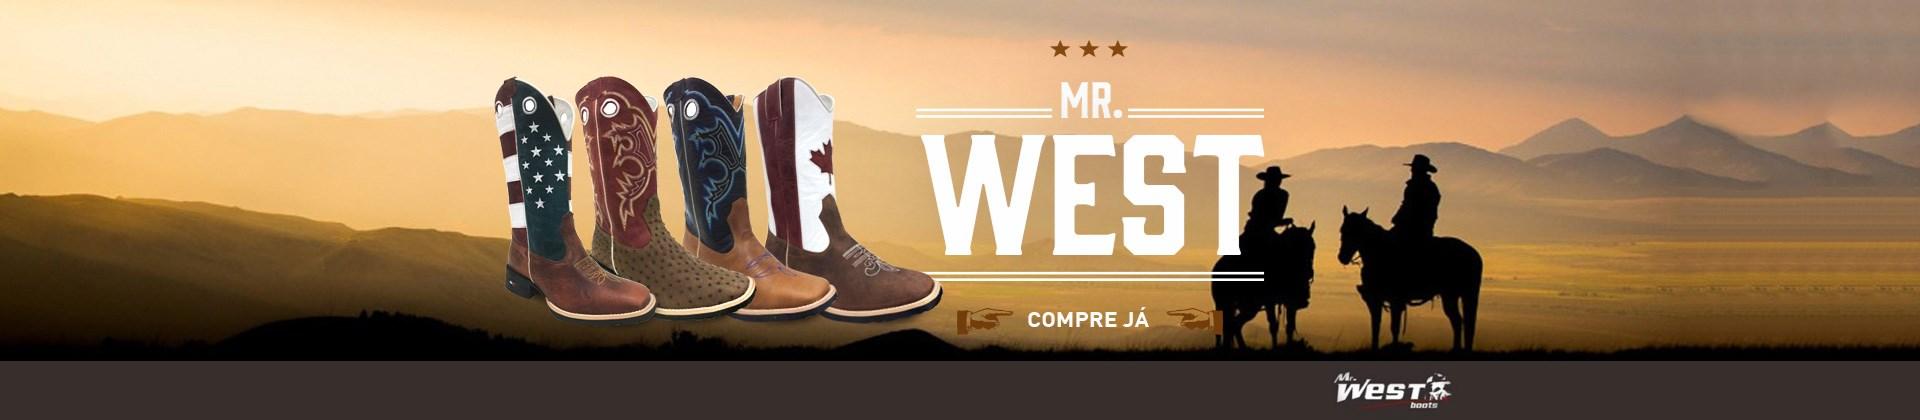 Mr West